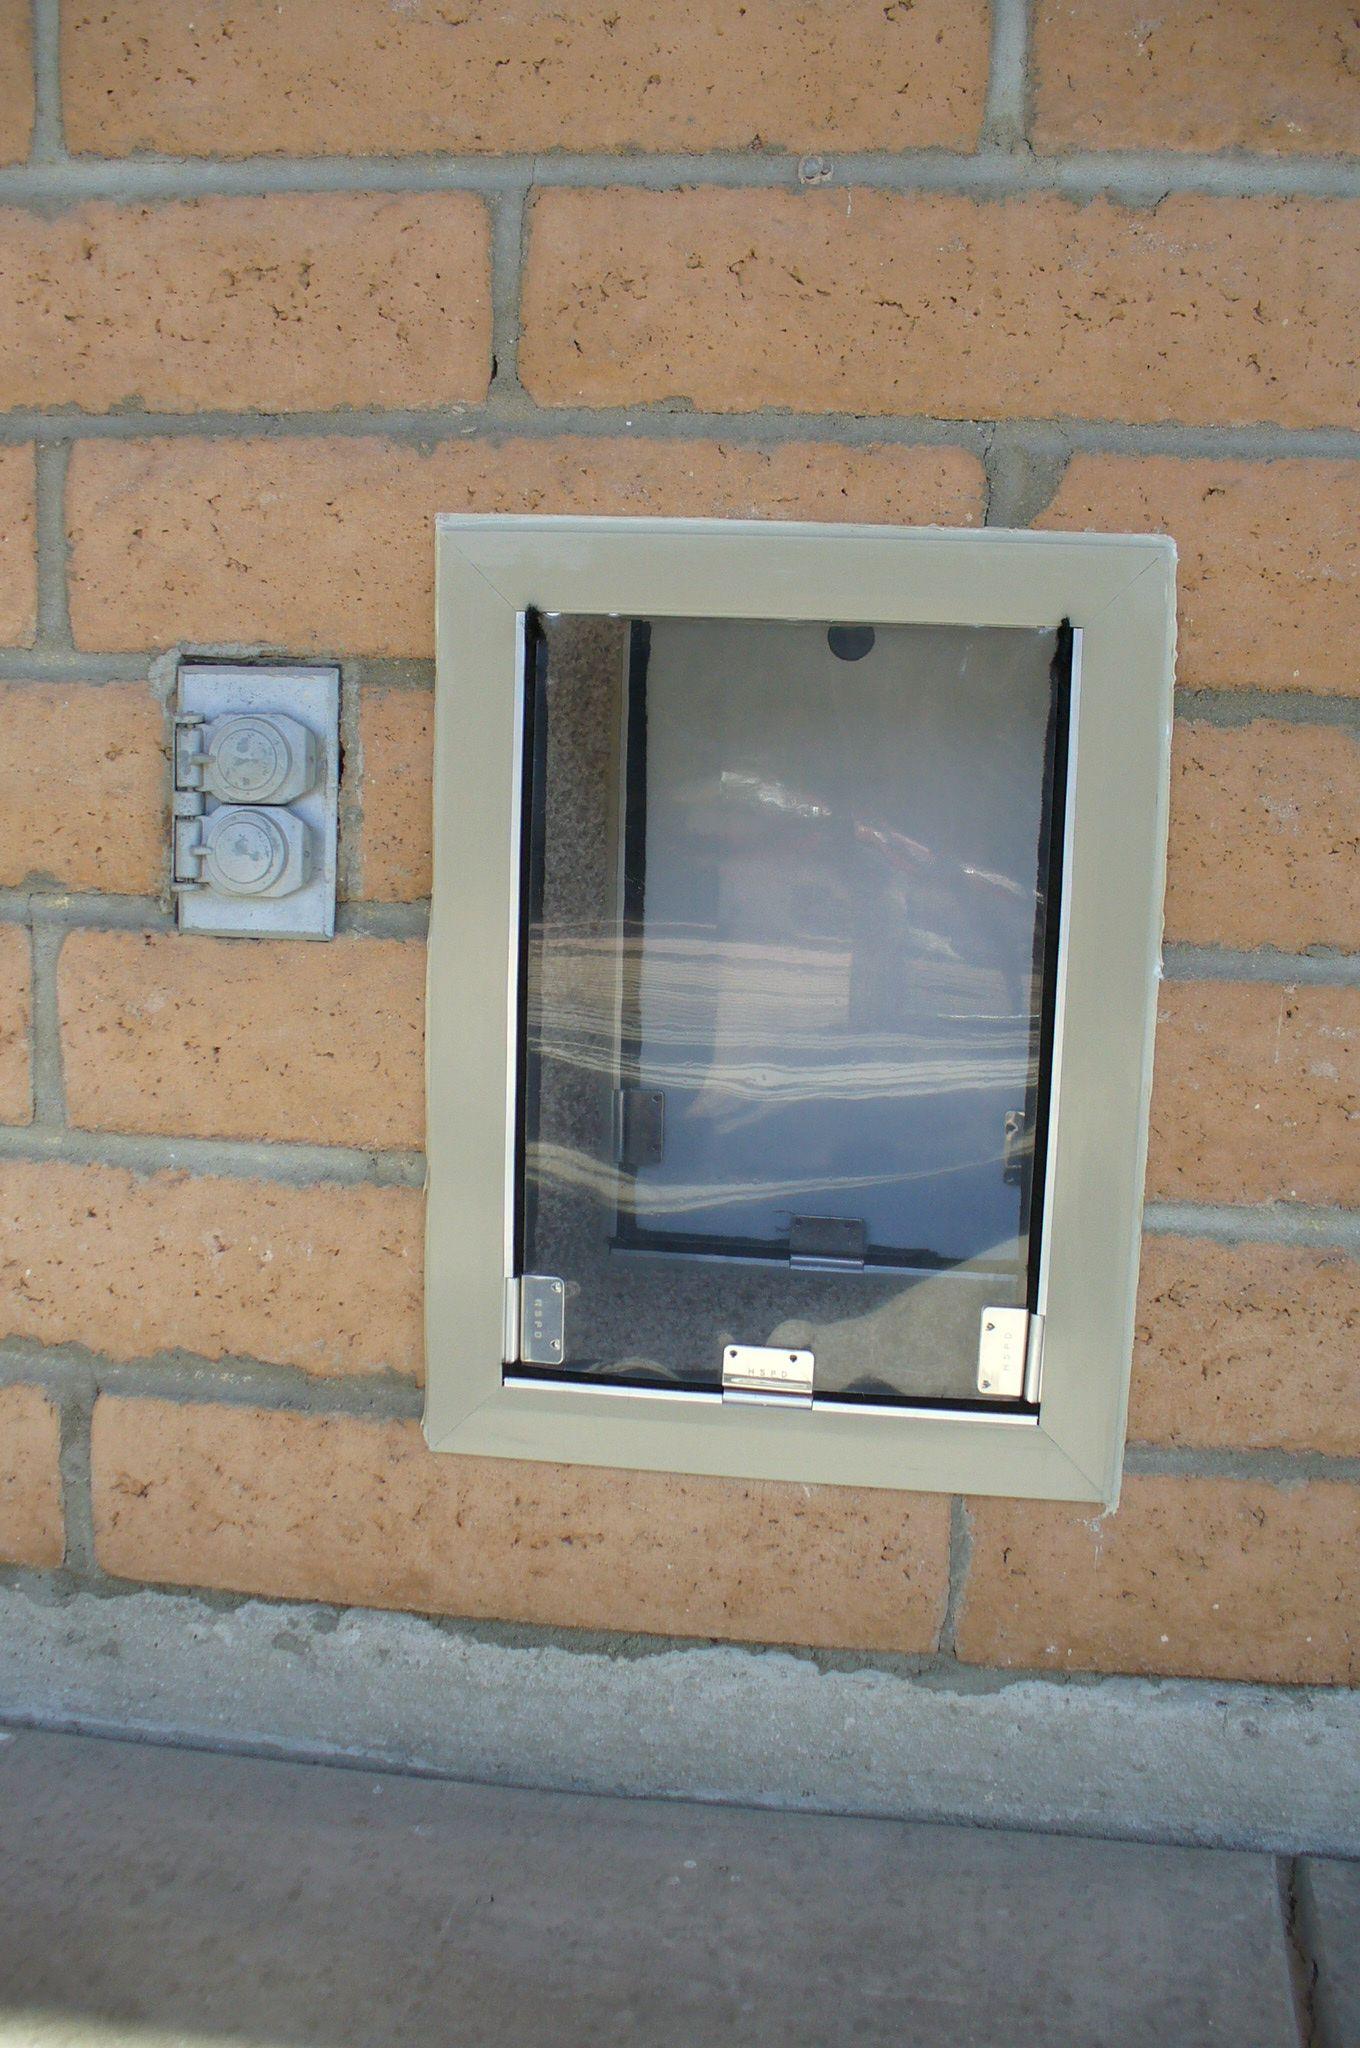 Dog Doors Can Be Installed In Block Walls This Type Of Block Is Called Slump Block Here In Arizona This Is A High Quality Wall Pet Door Pet Doors Backyard